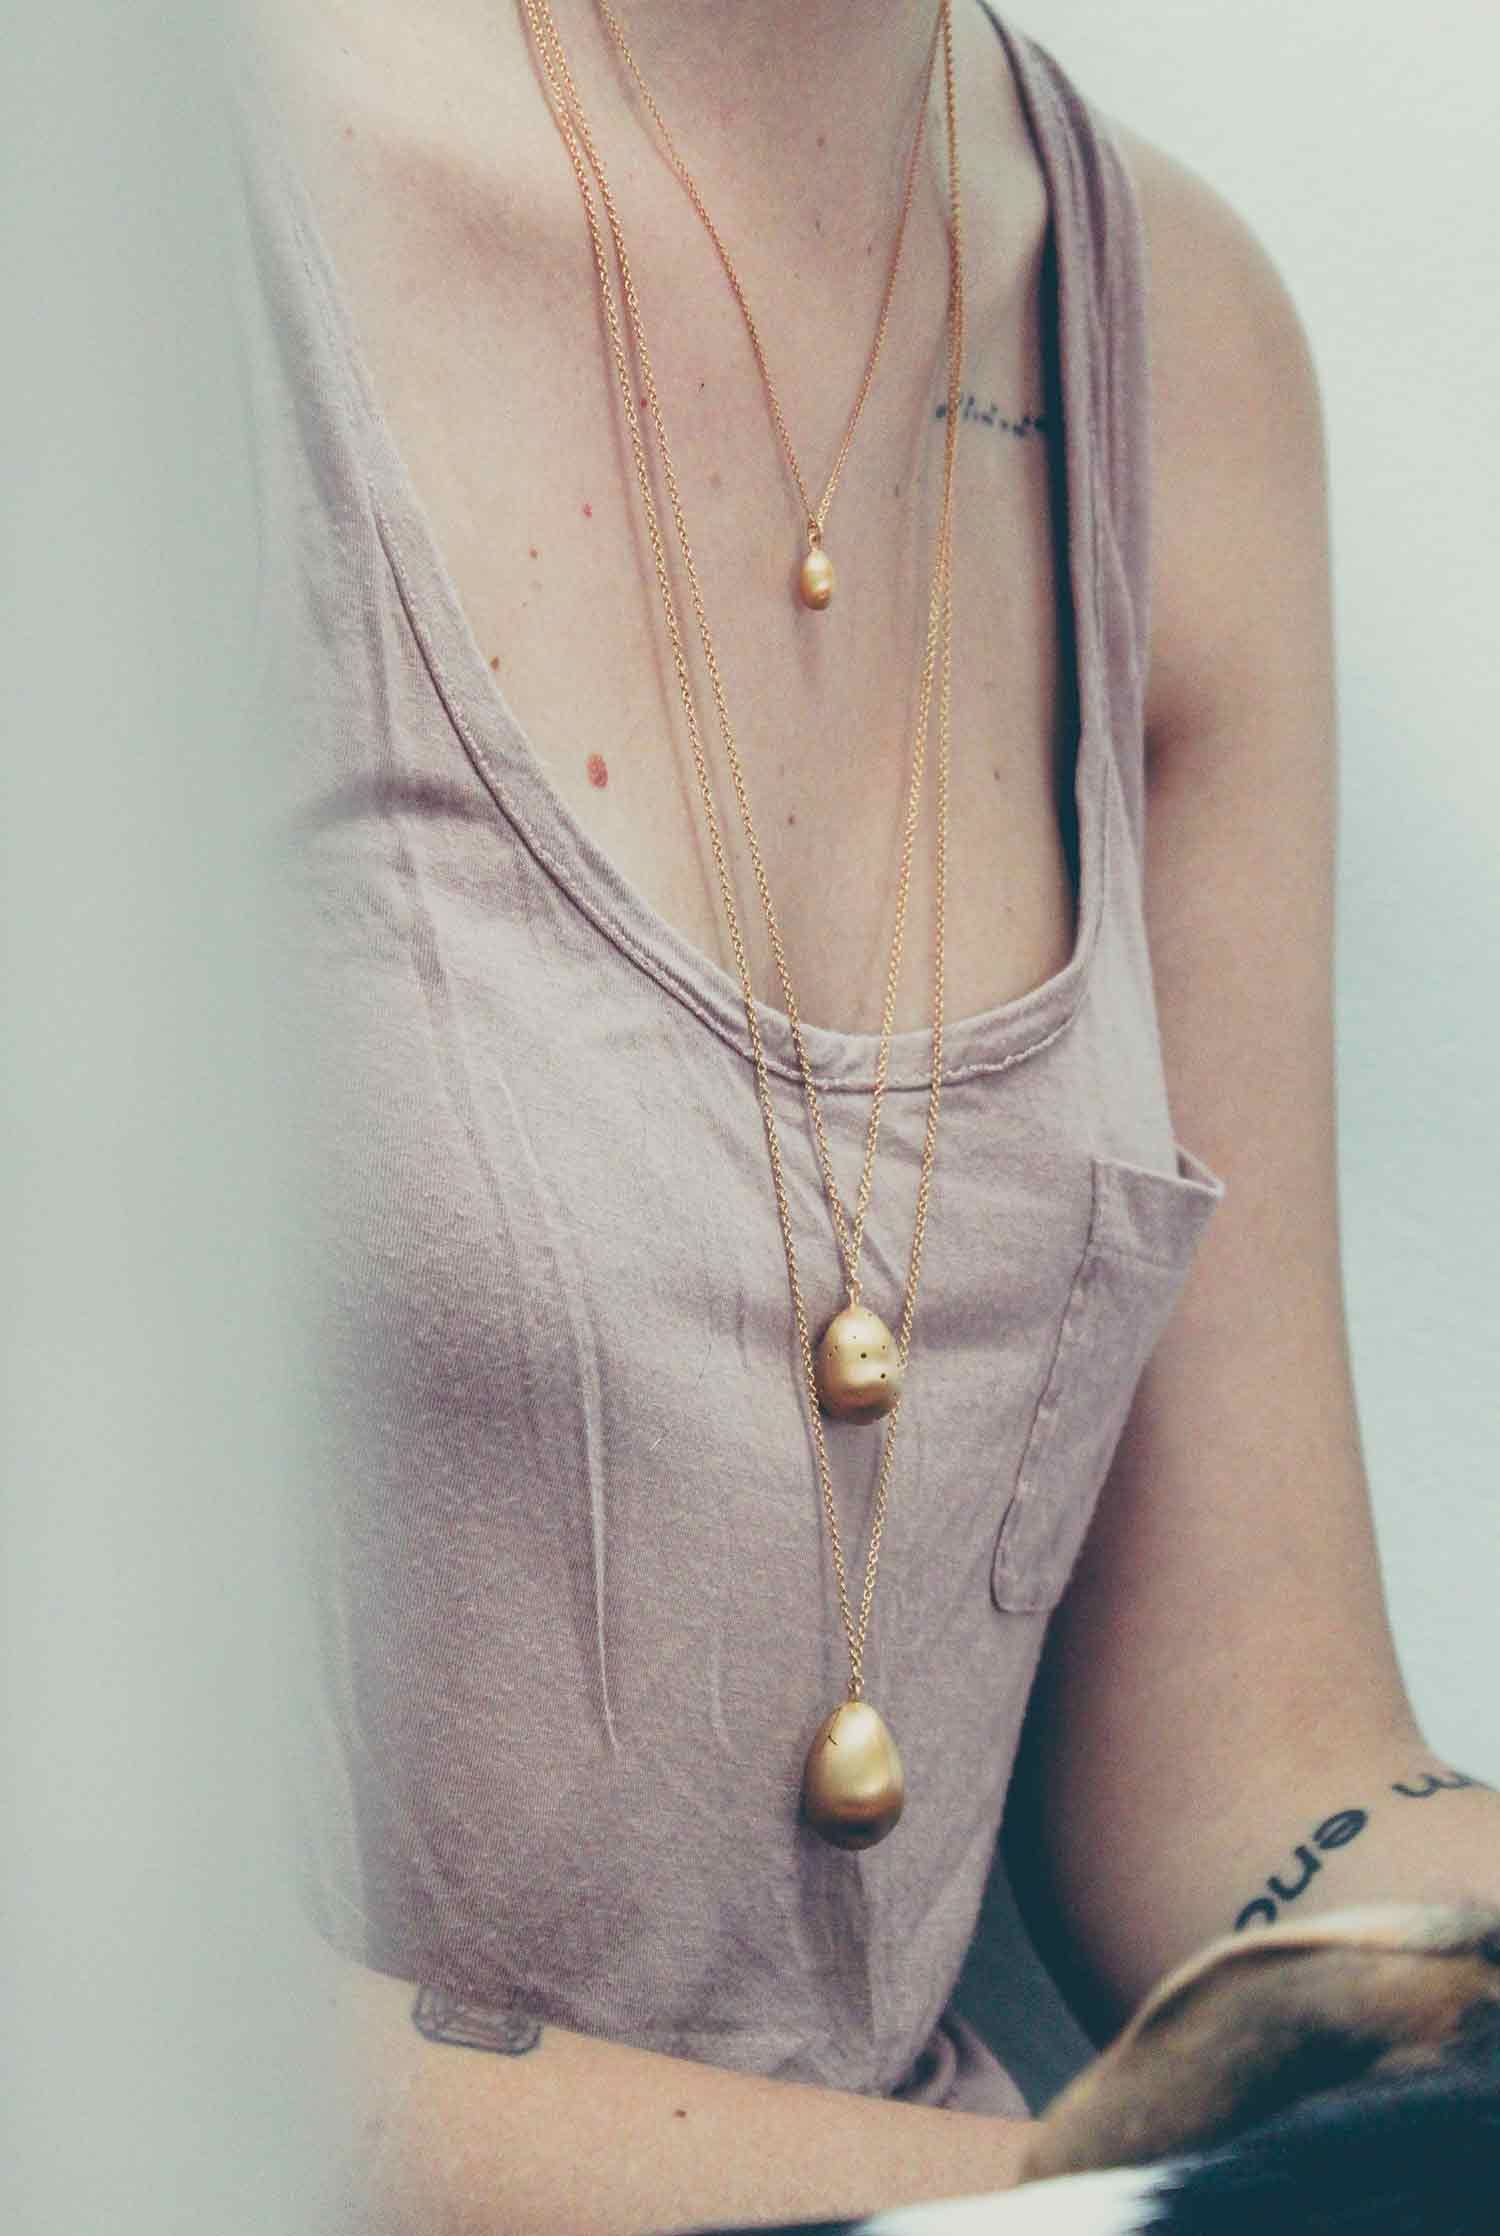 hannah-blount-jewelry-photography4.jpg